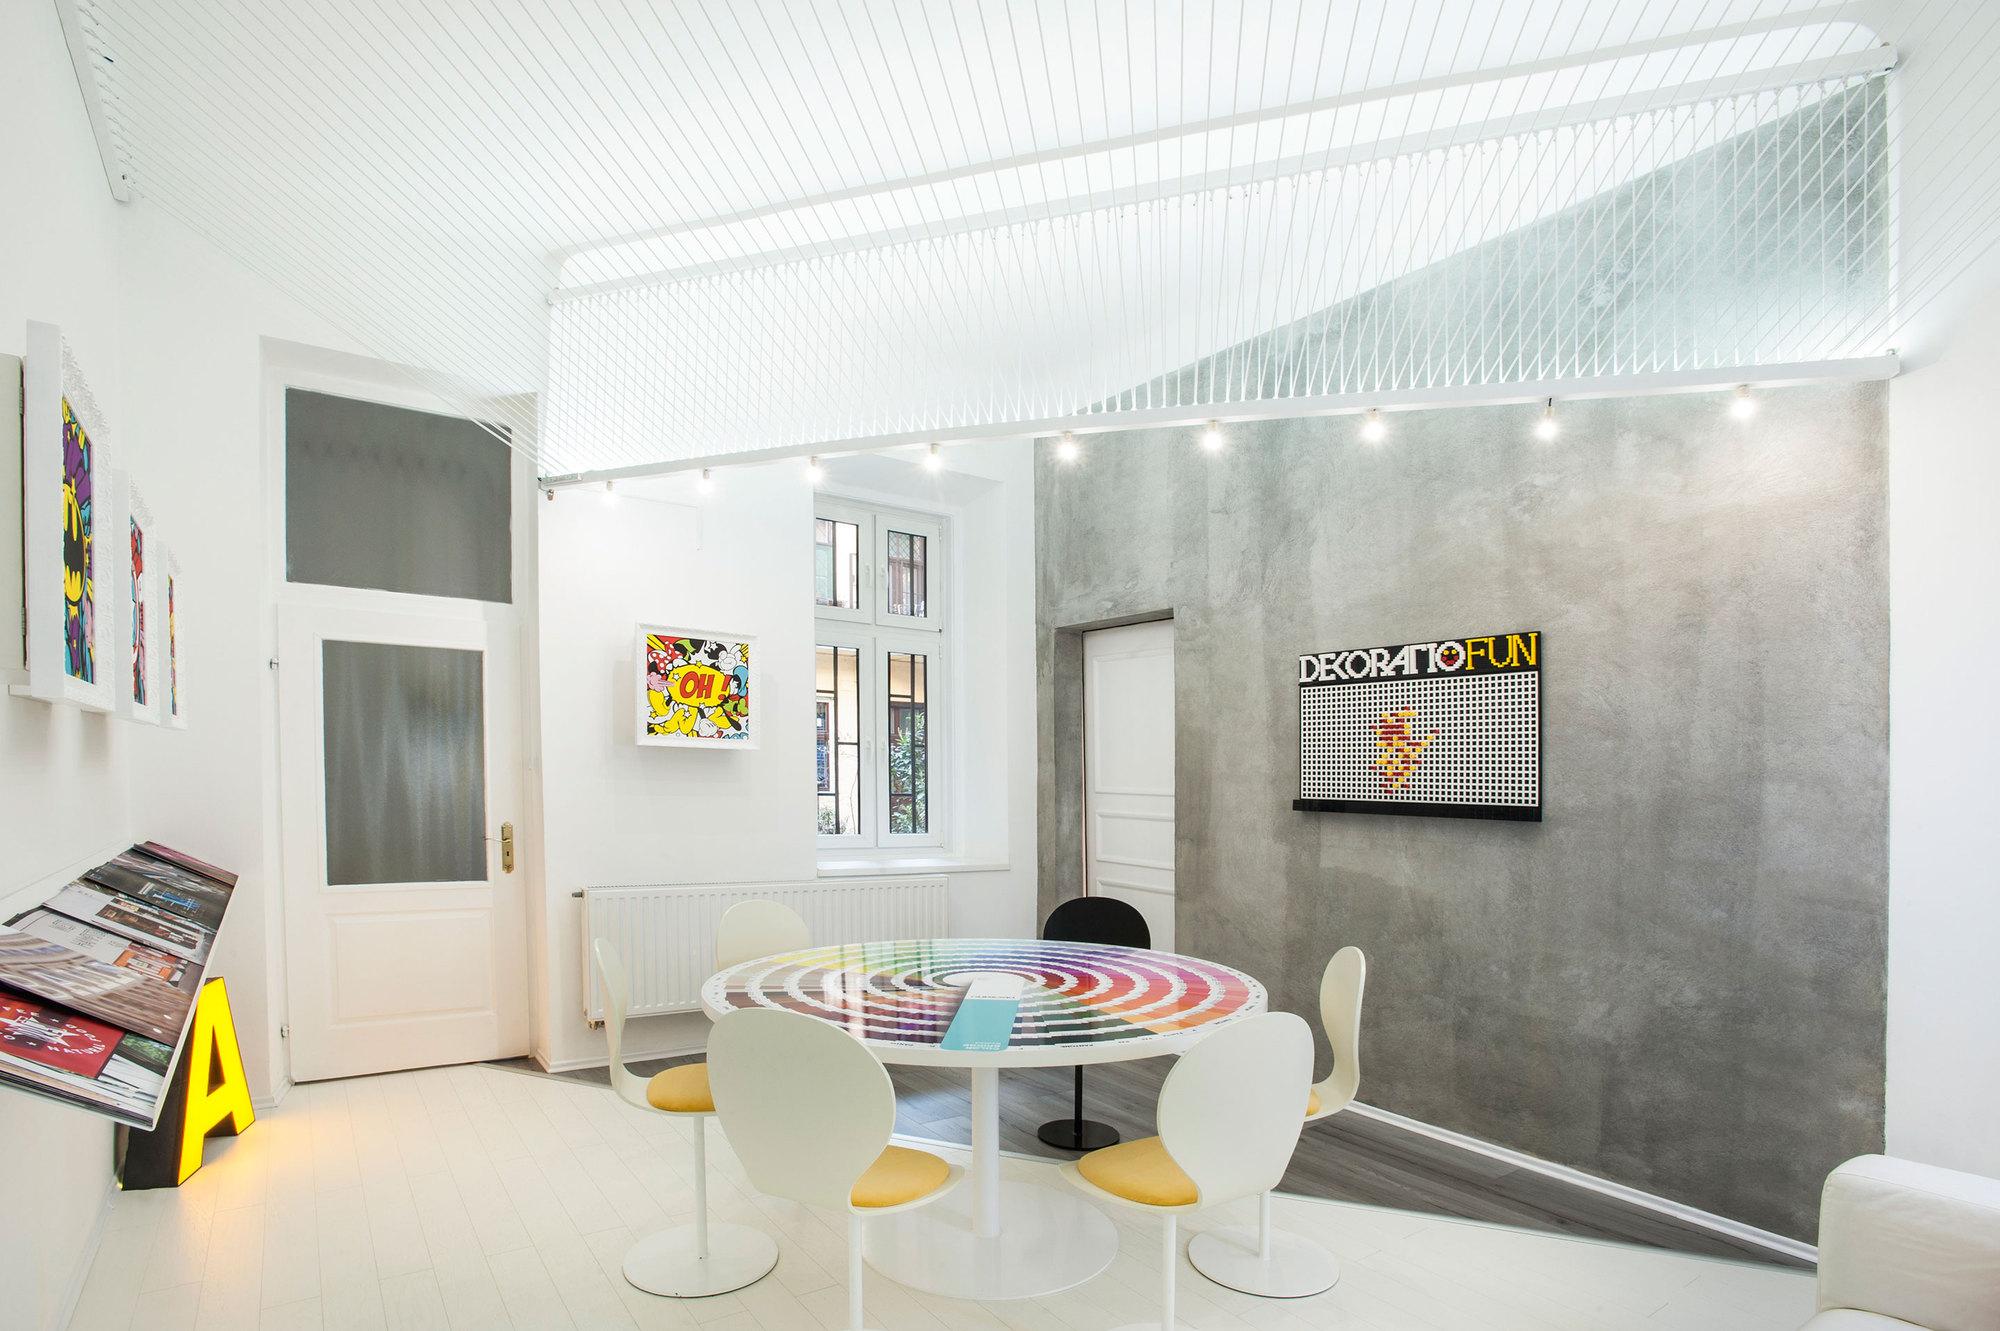 Dekoratio Branding & Design Studio in Budapest - the vandallist (13)